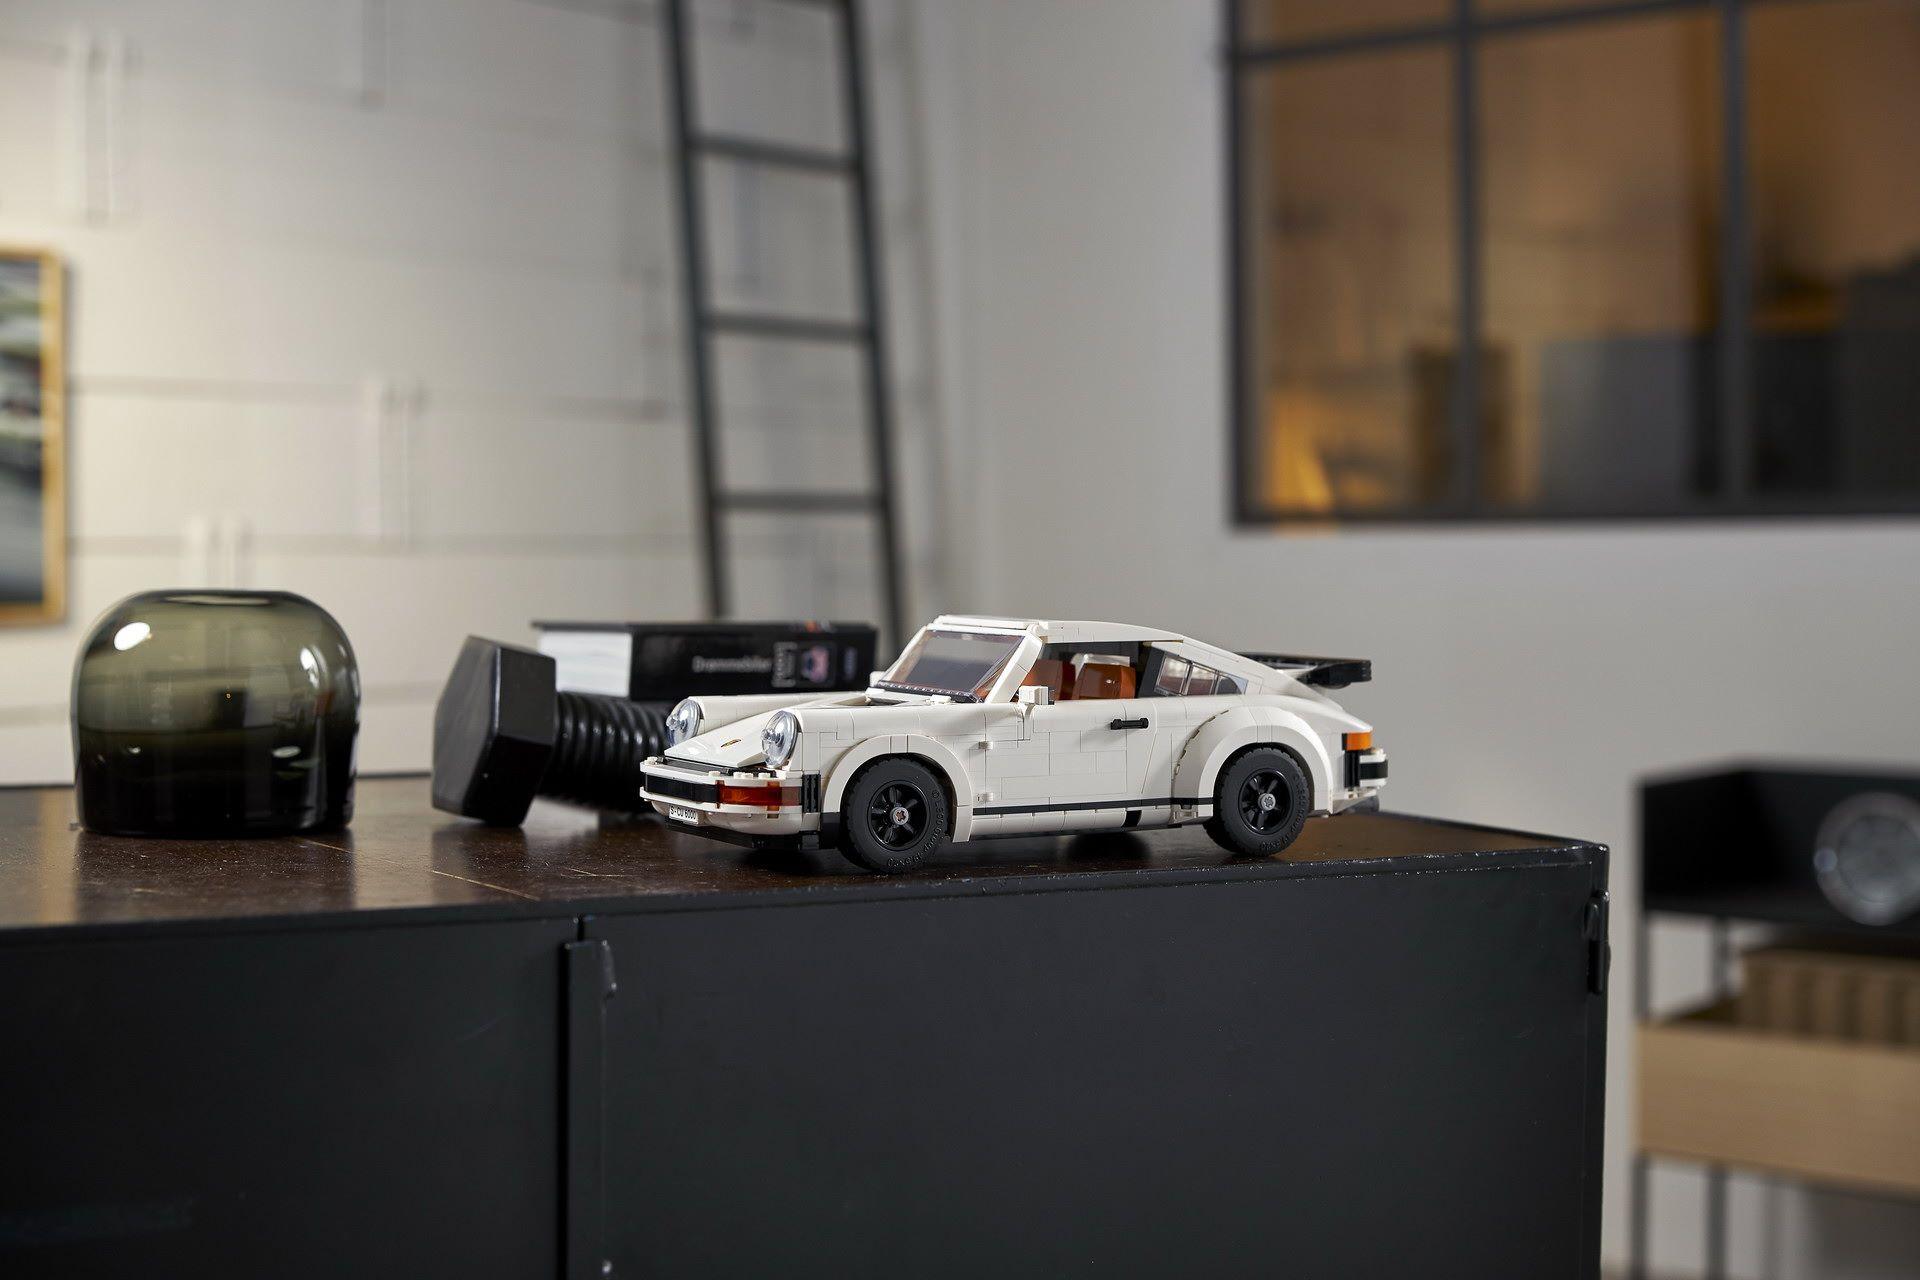 Porsche-911-Turbo-and-Targa-kit-8